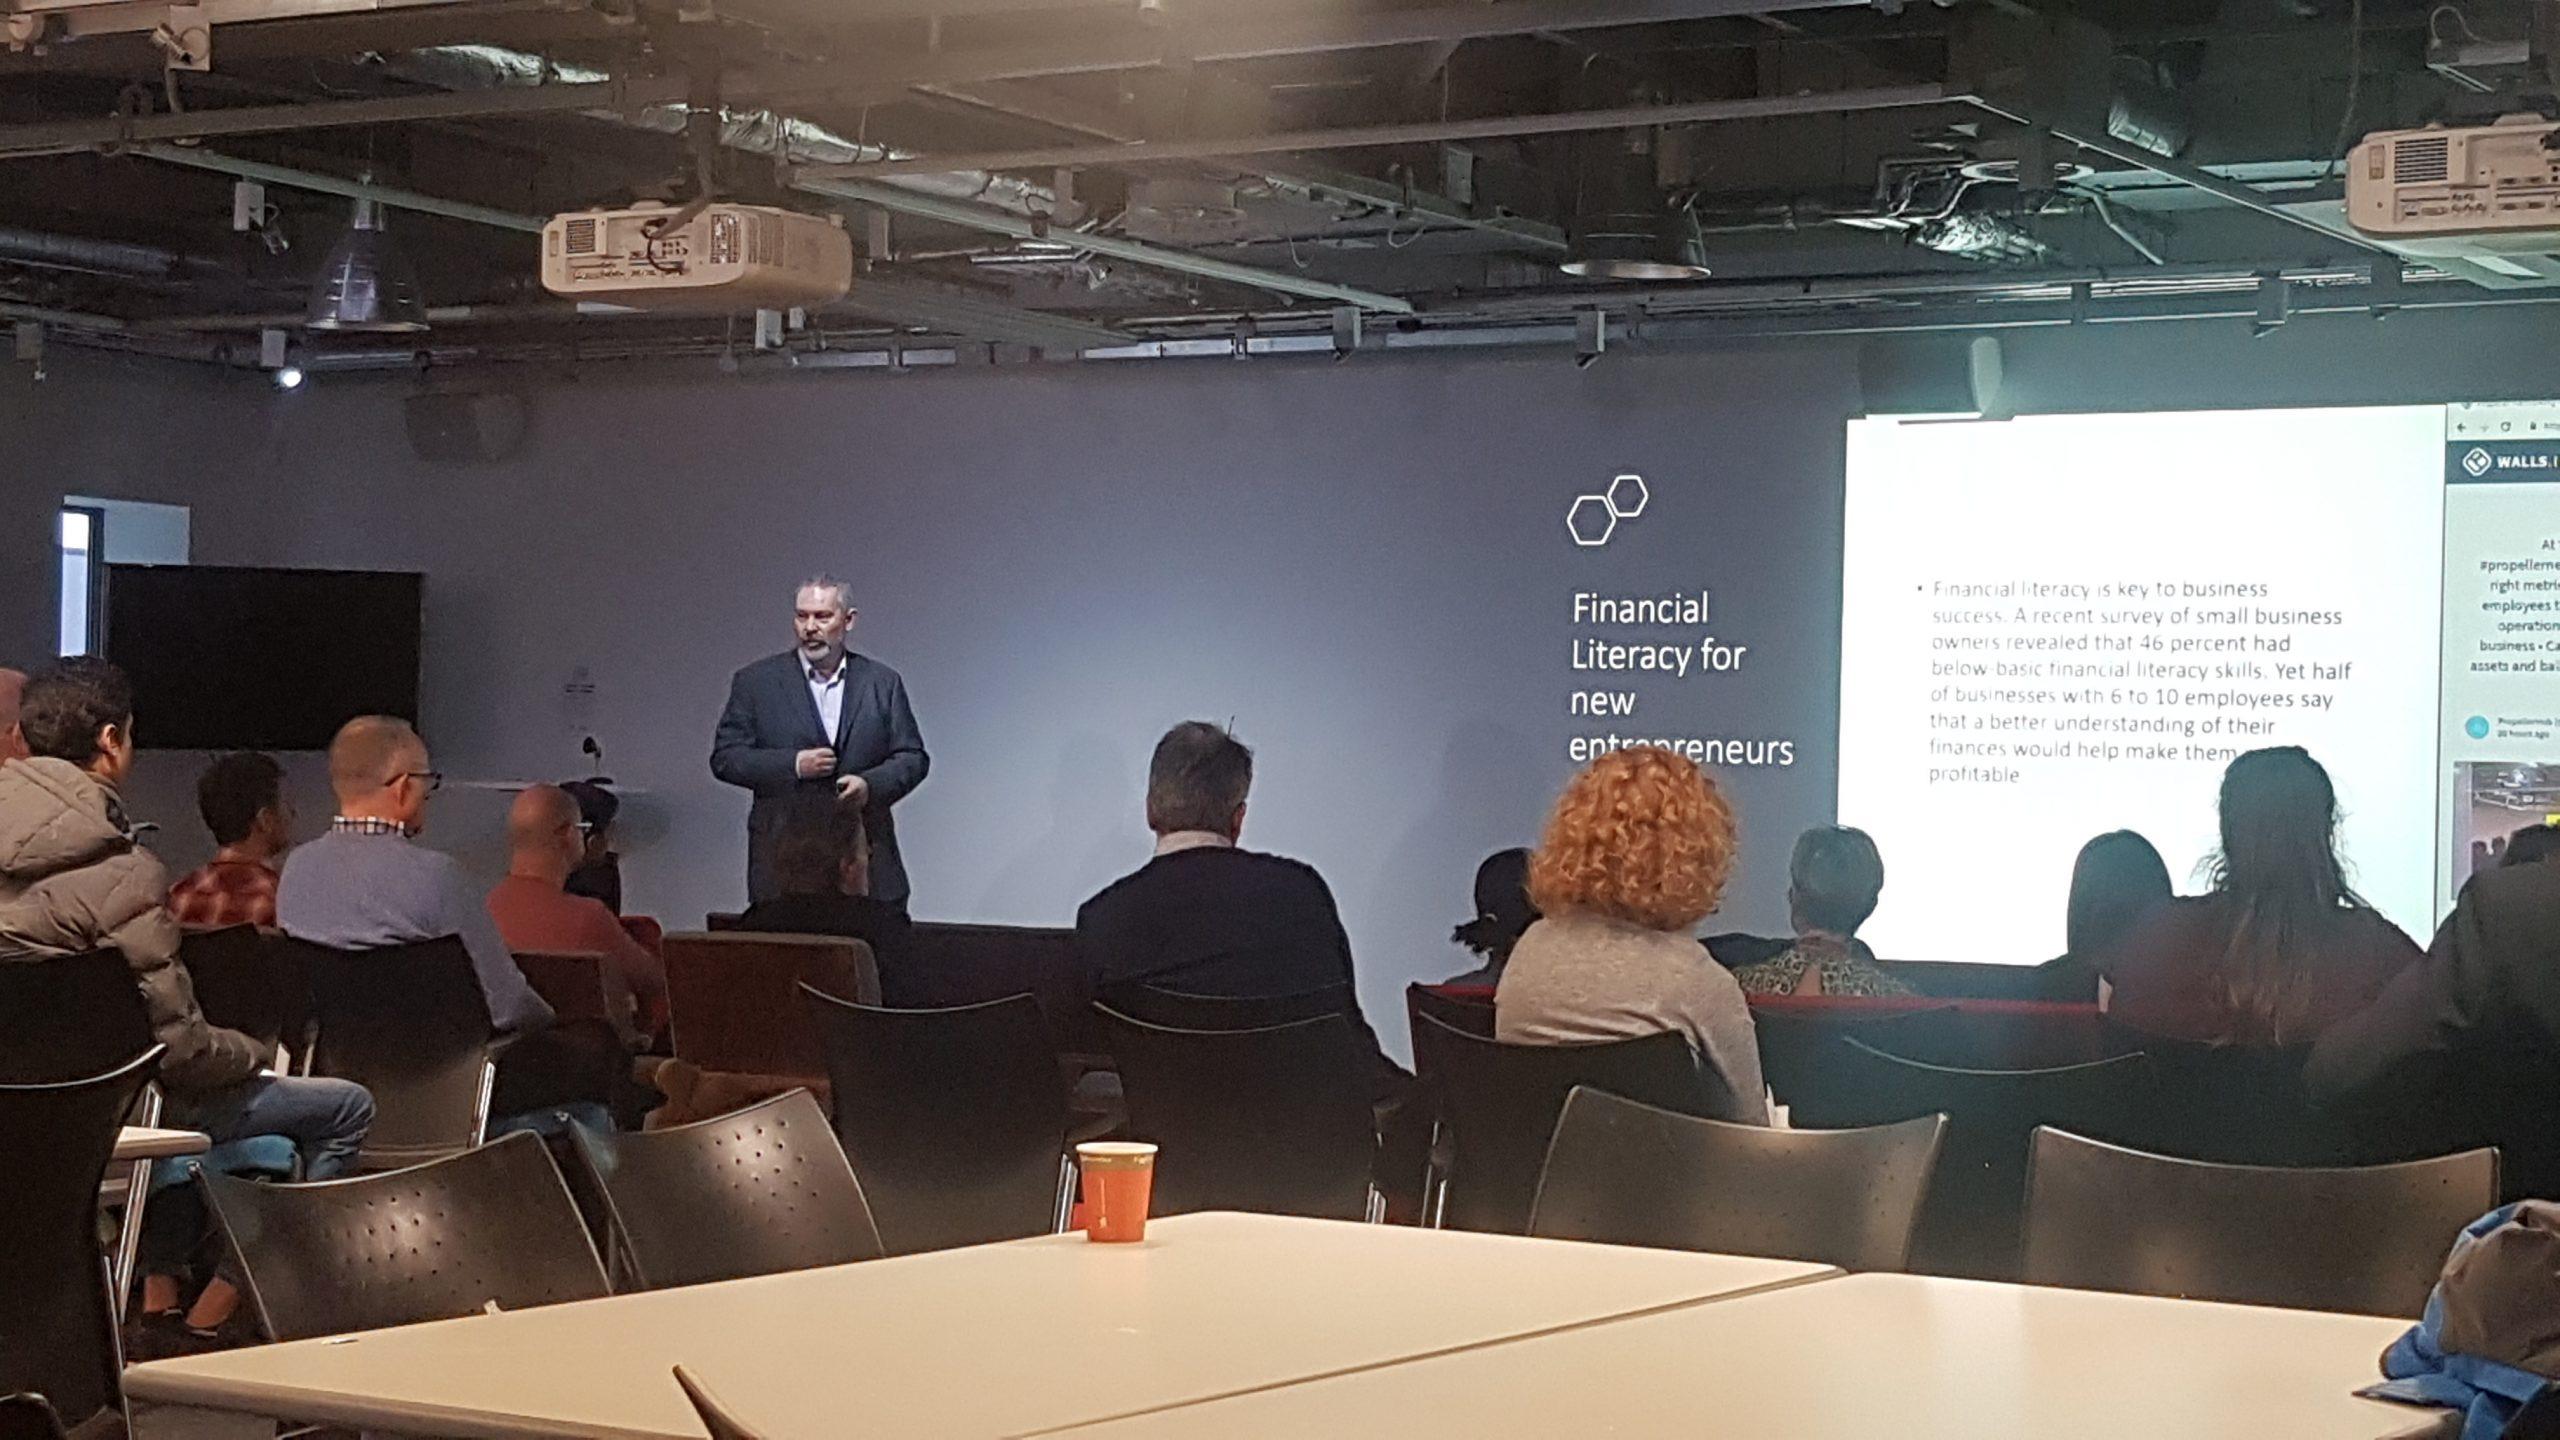 presentation on financial literacy for new entrepreneurs